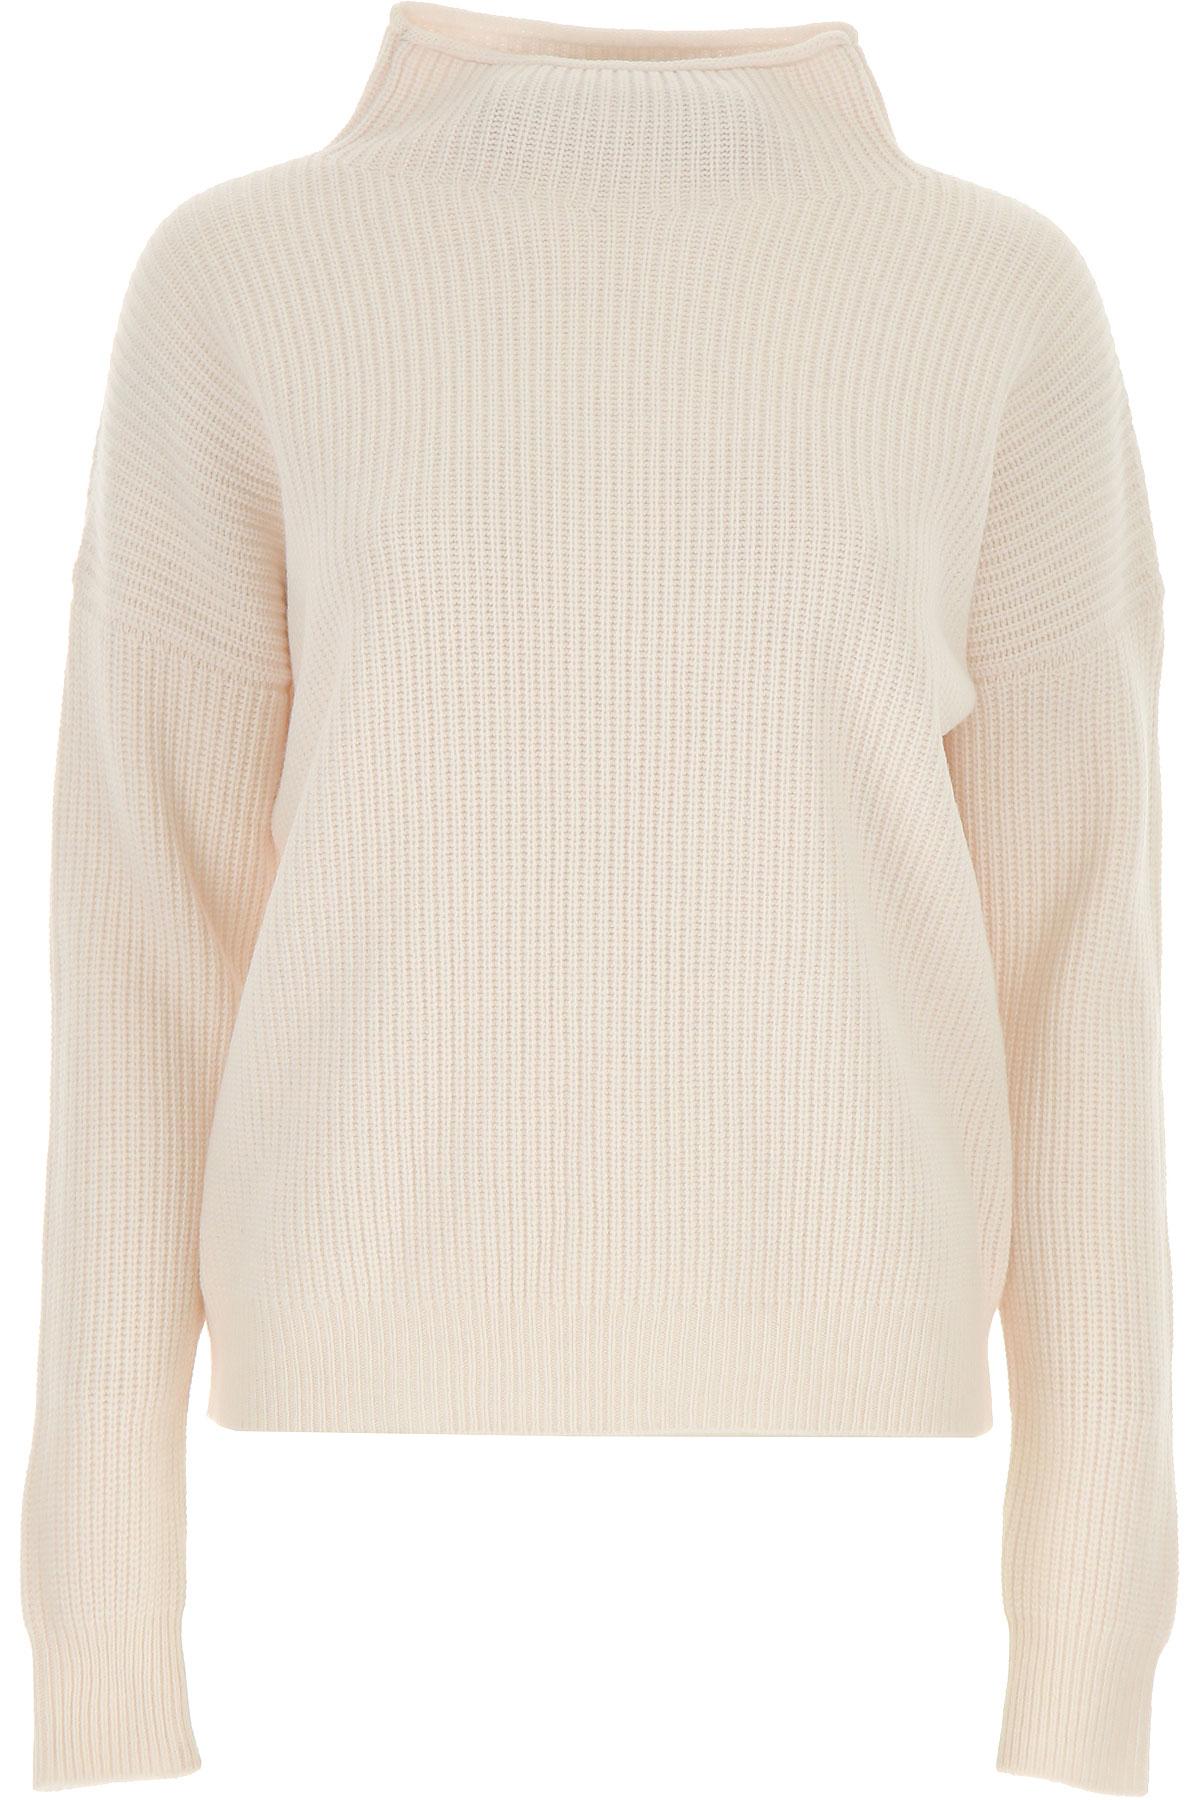 Peserico Sweater for Women Jumper On Sale, Milk, Wool, 2019, 10 6 8